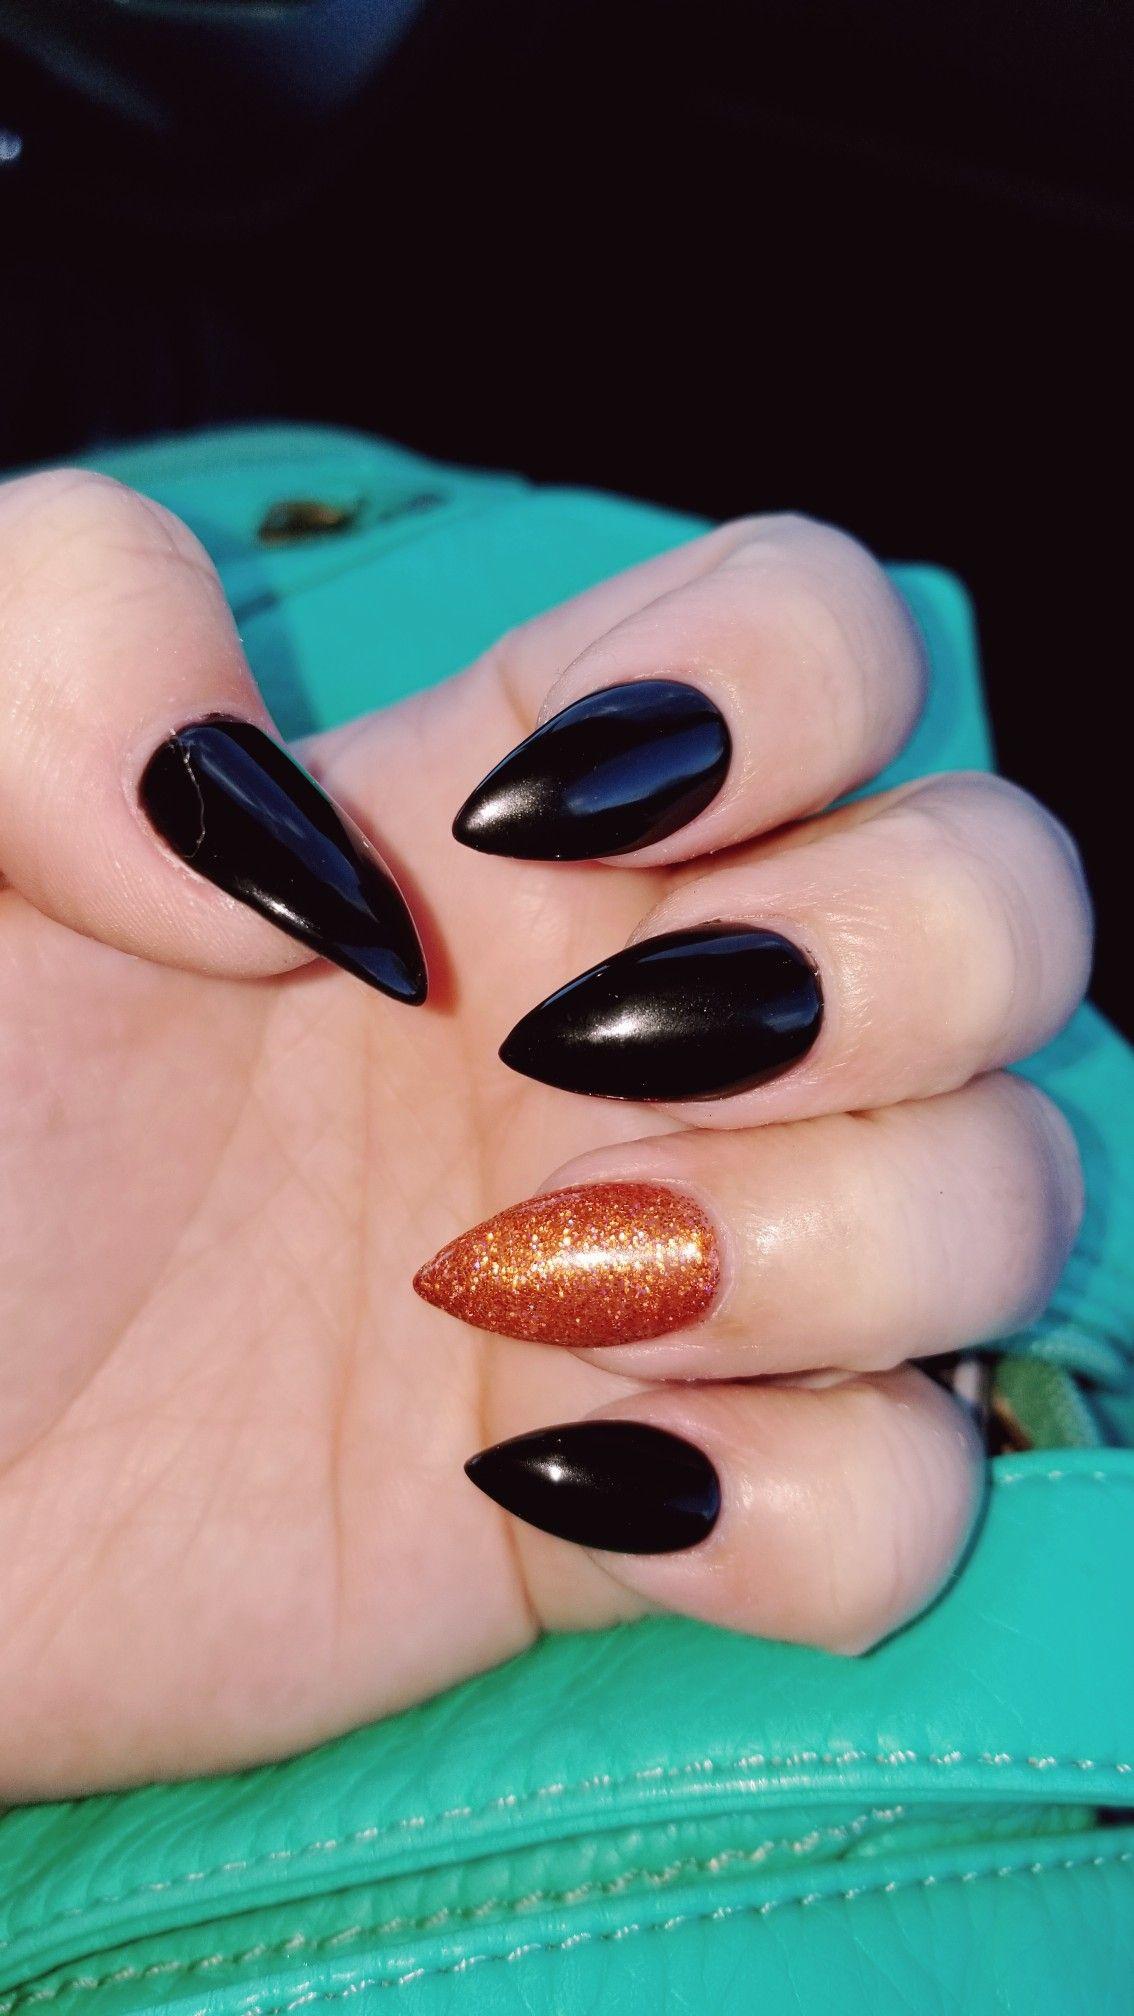 Pin by Amanda Tyrrell on nails | Halloween acrylic nails ...